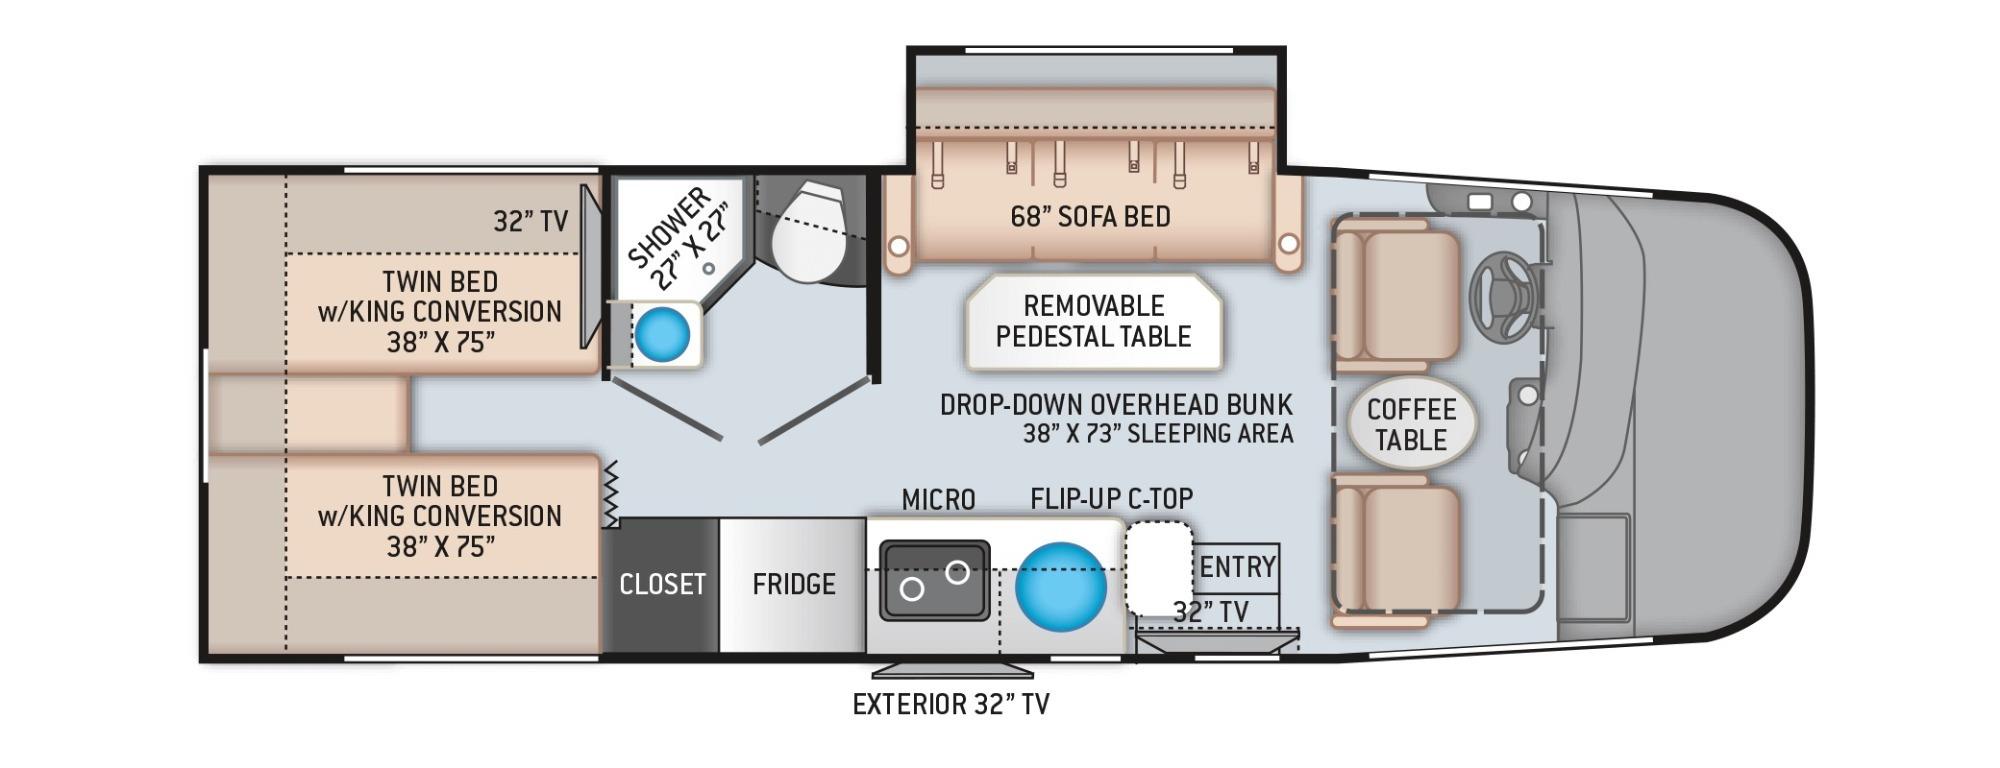 View Floor Plan for 2022 THOR VEGAS 24.1